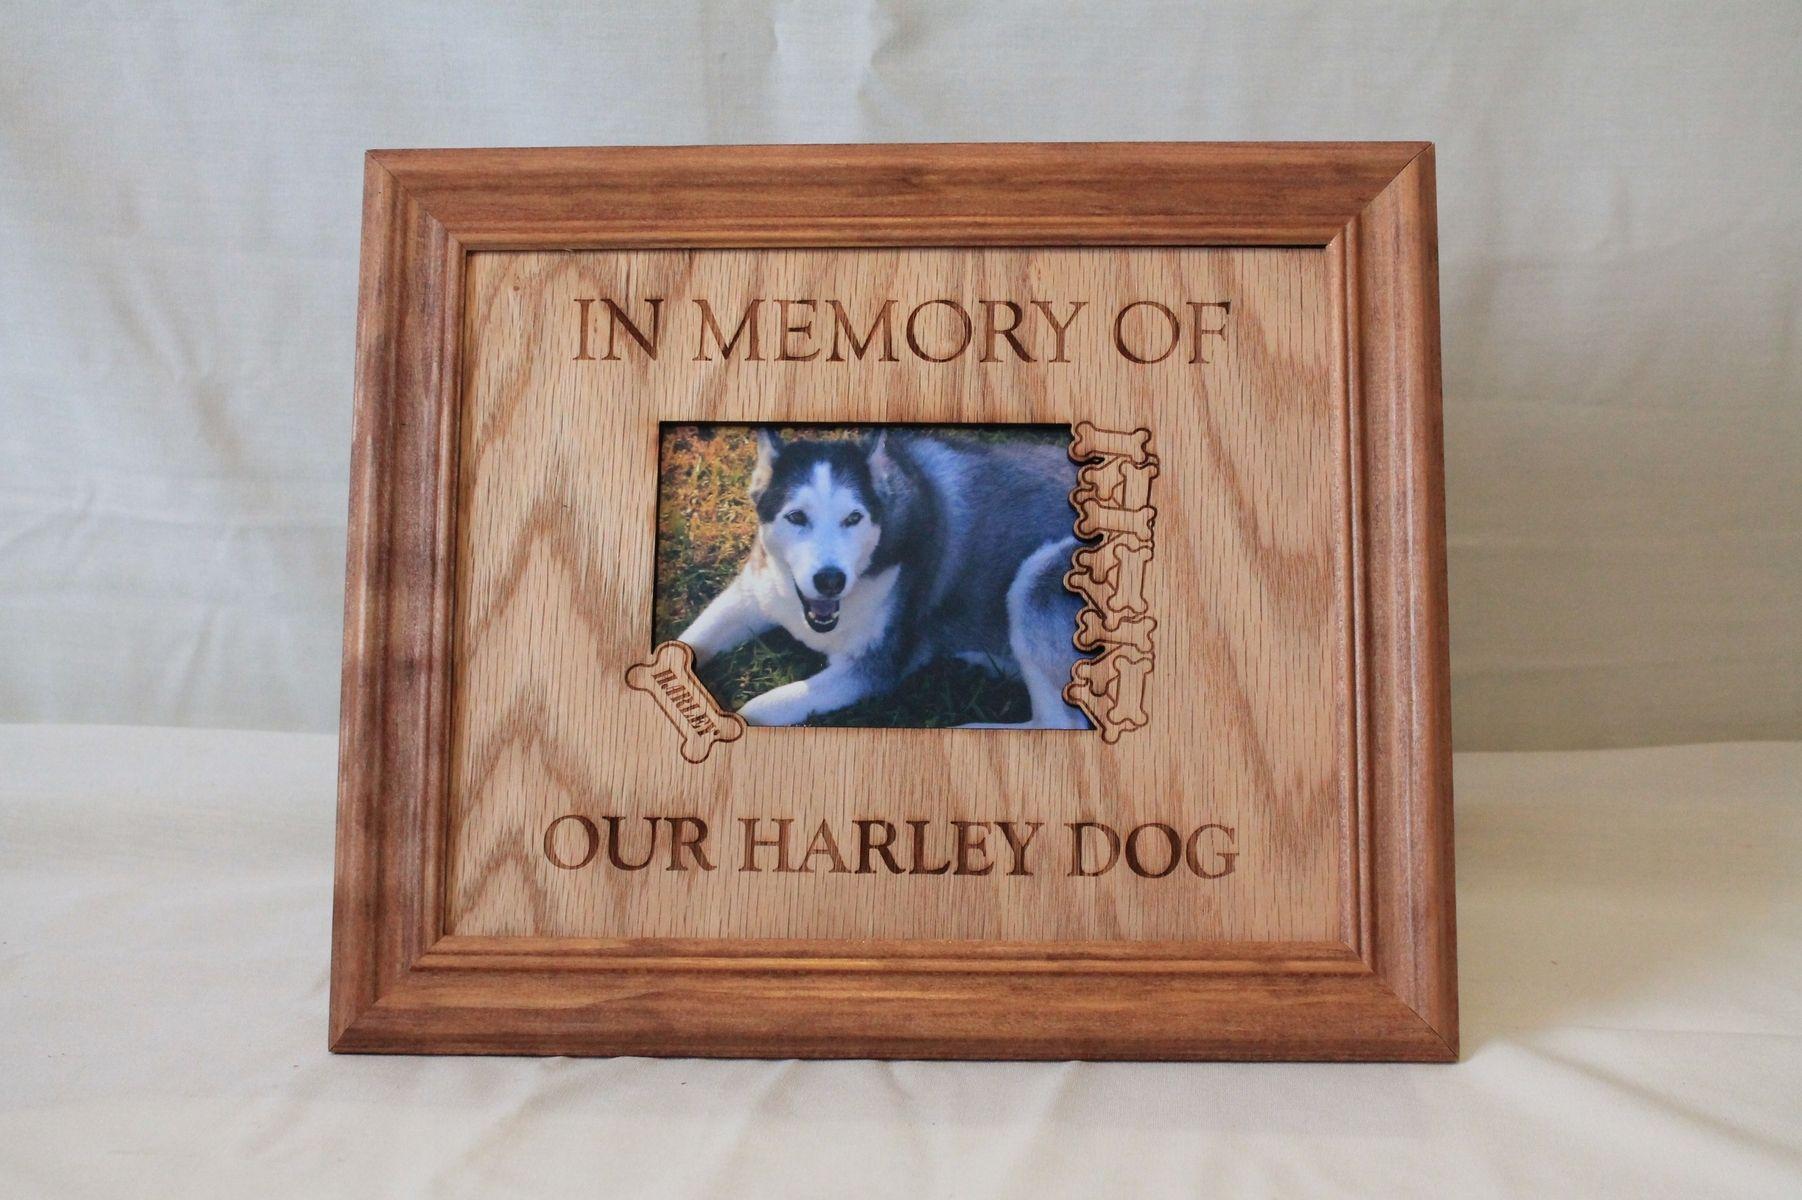 Handmade Pet Memorial Frames by Treasure Coast Engraving ...